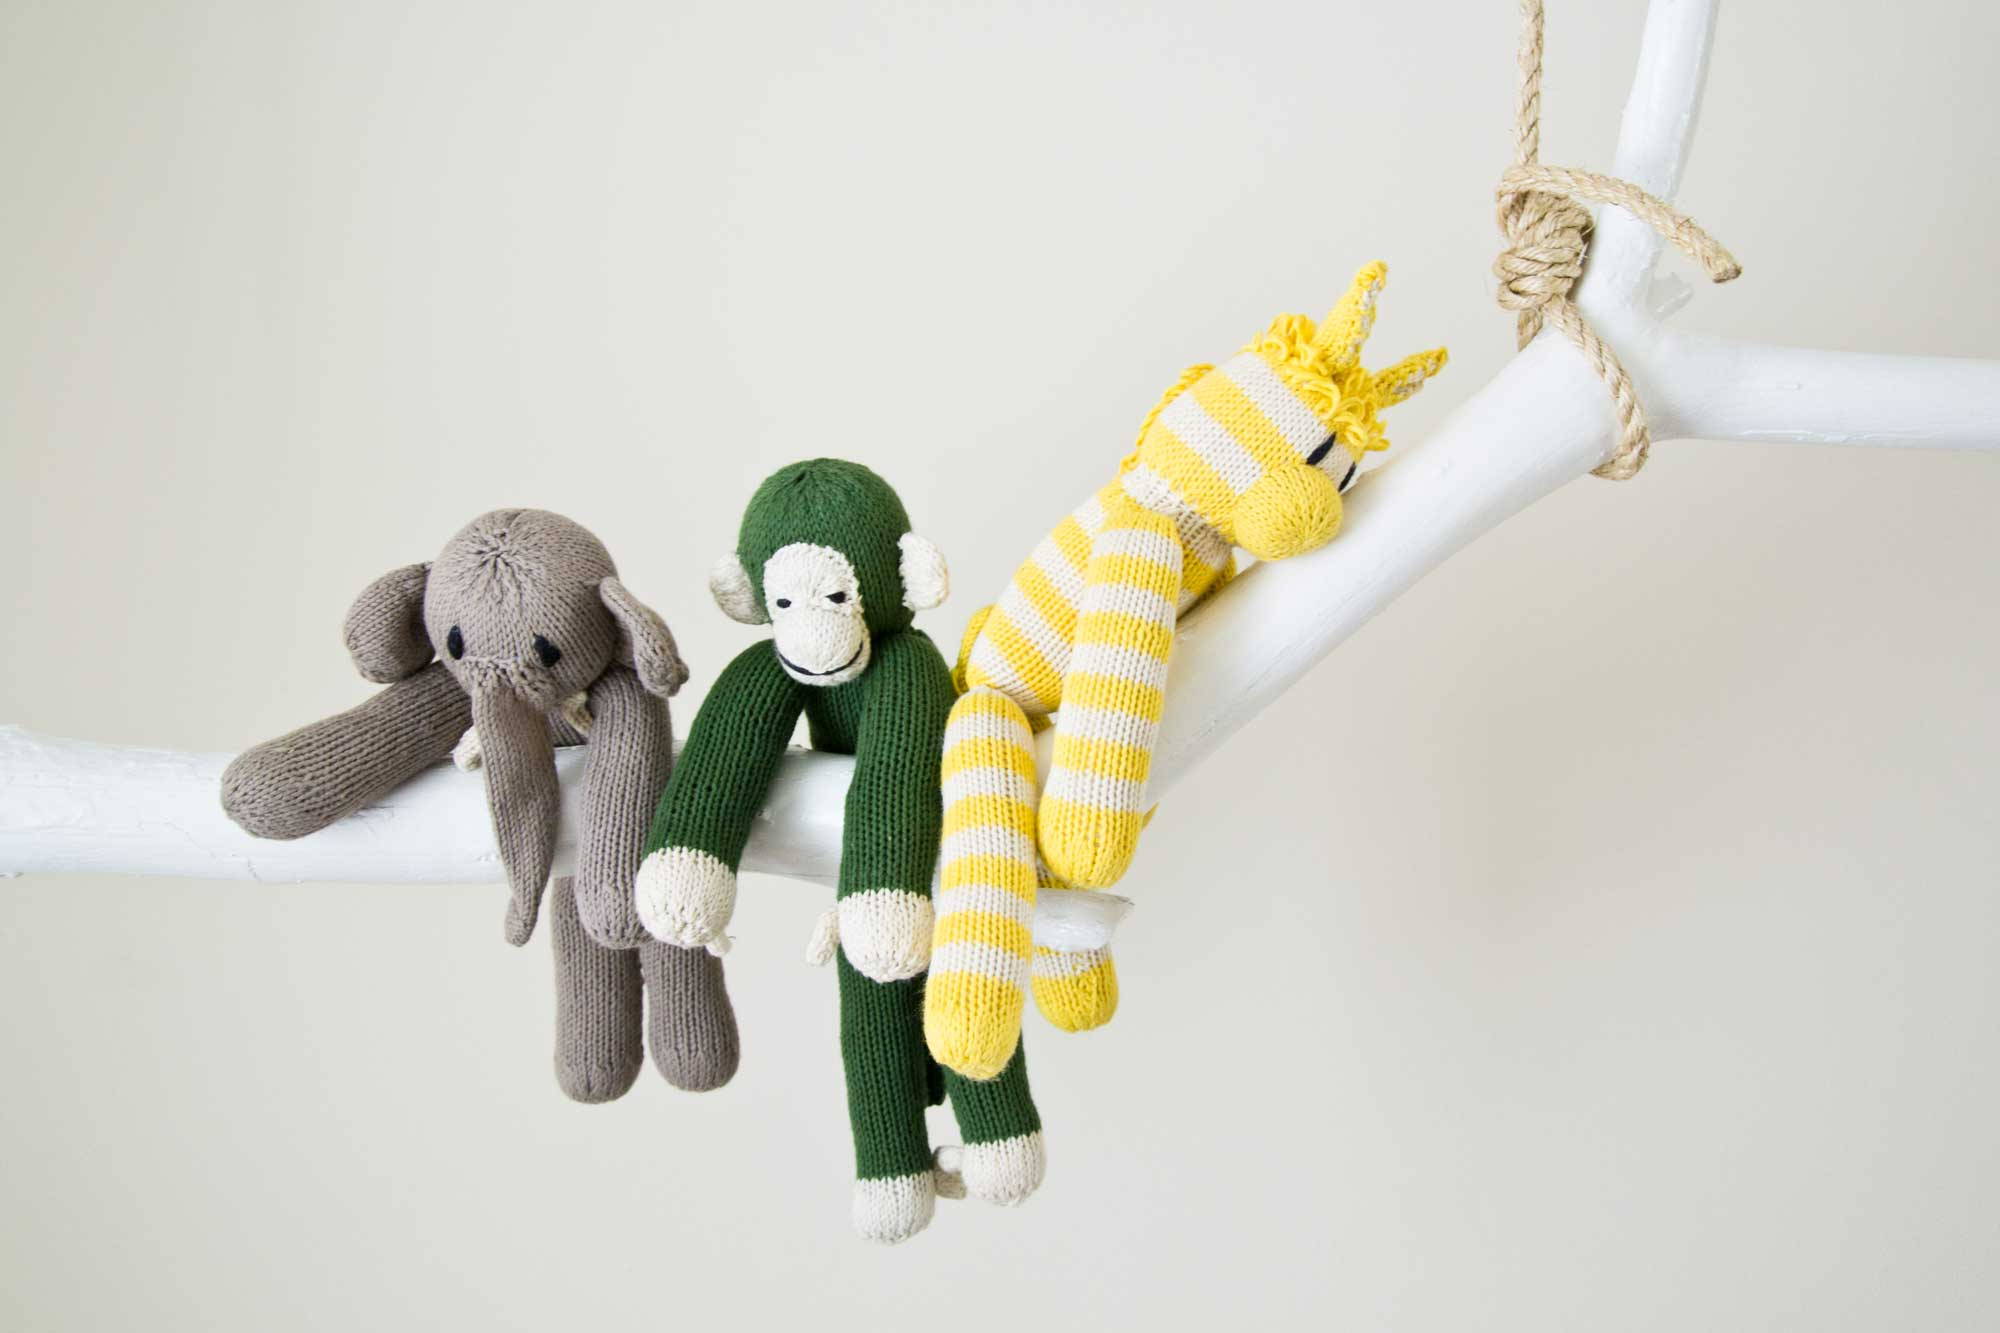 Gebreide knuffels van Kenana Knitters | foto door Paulina Arcklin